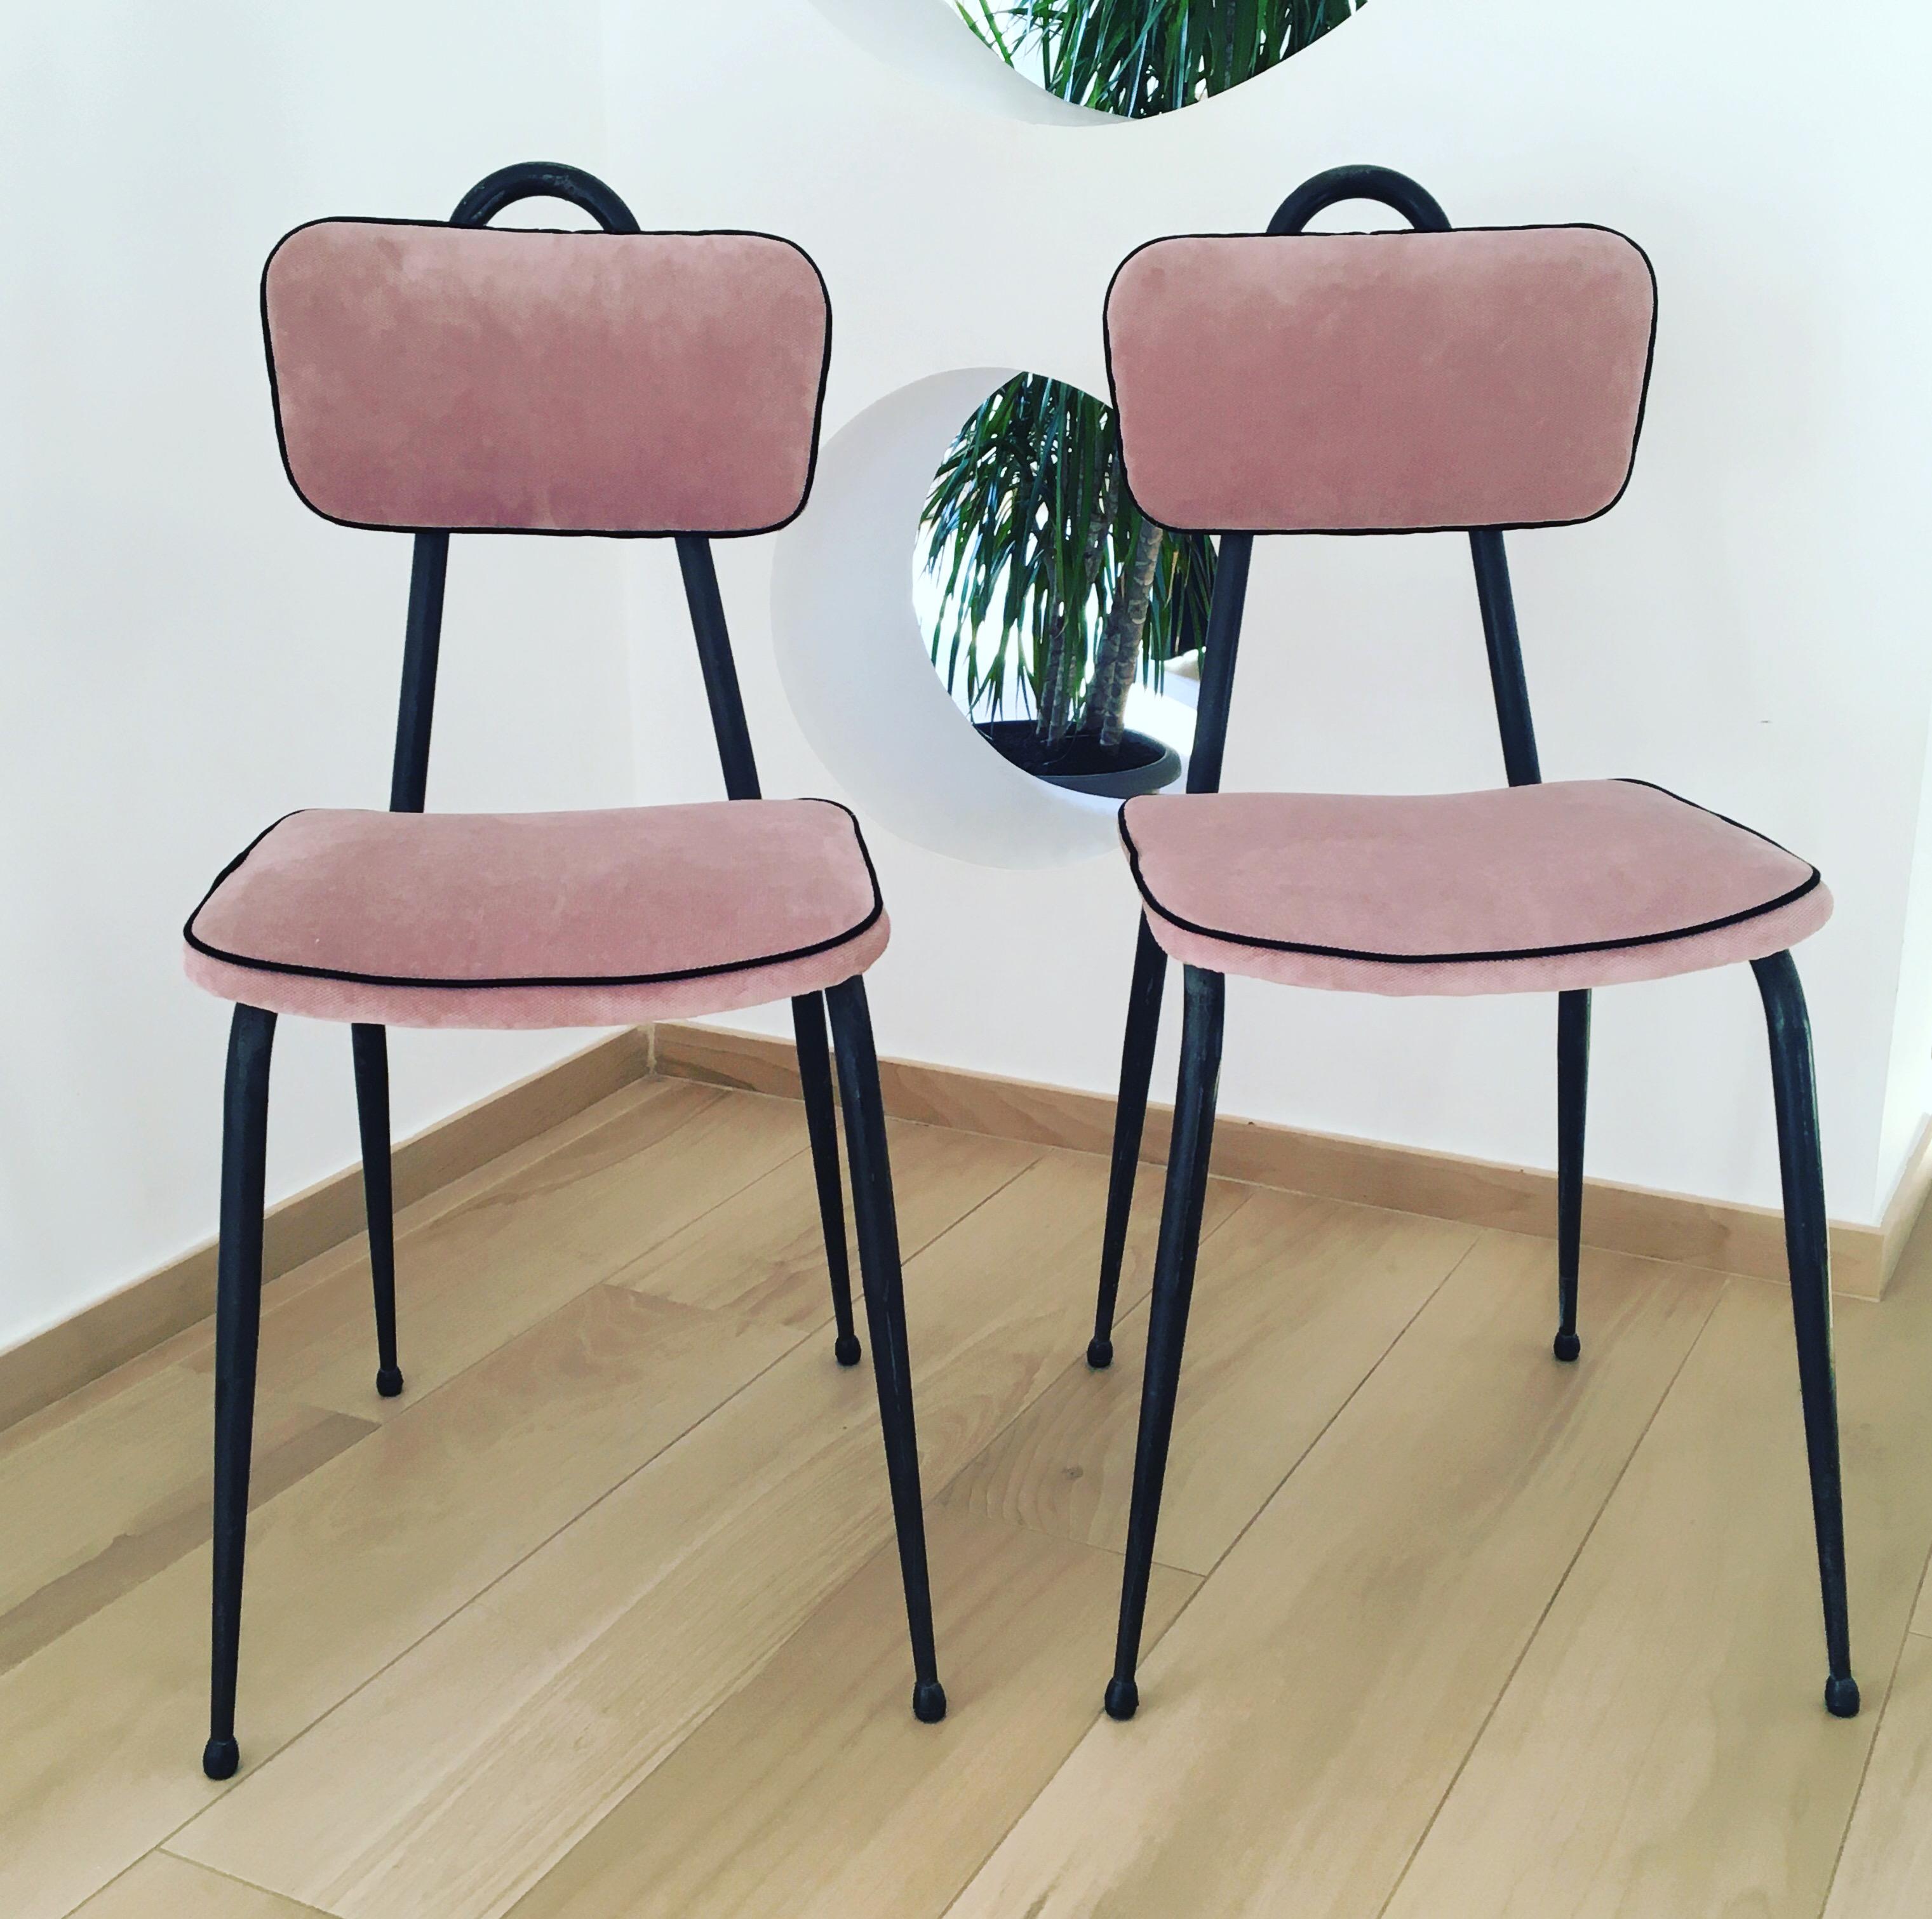 a38ab-pink-black-italian-chairs-ok